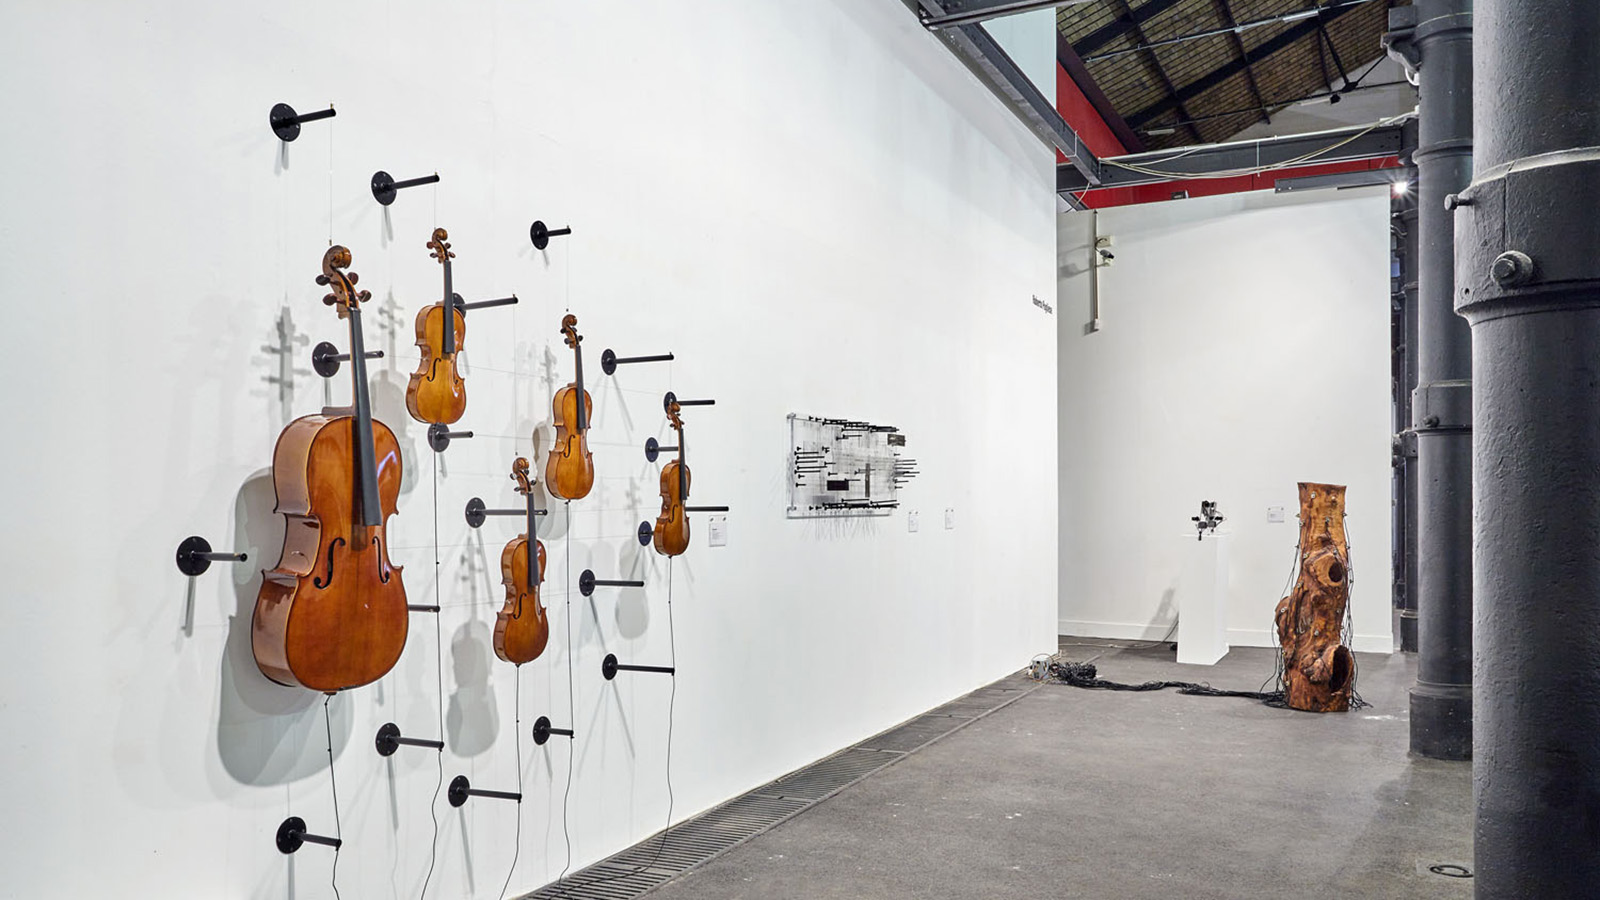 Pugliese violoncelli